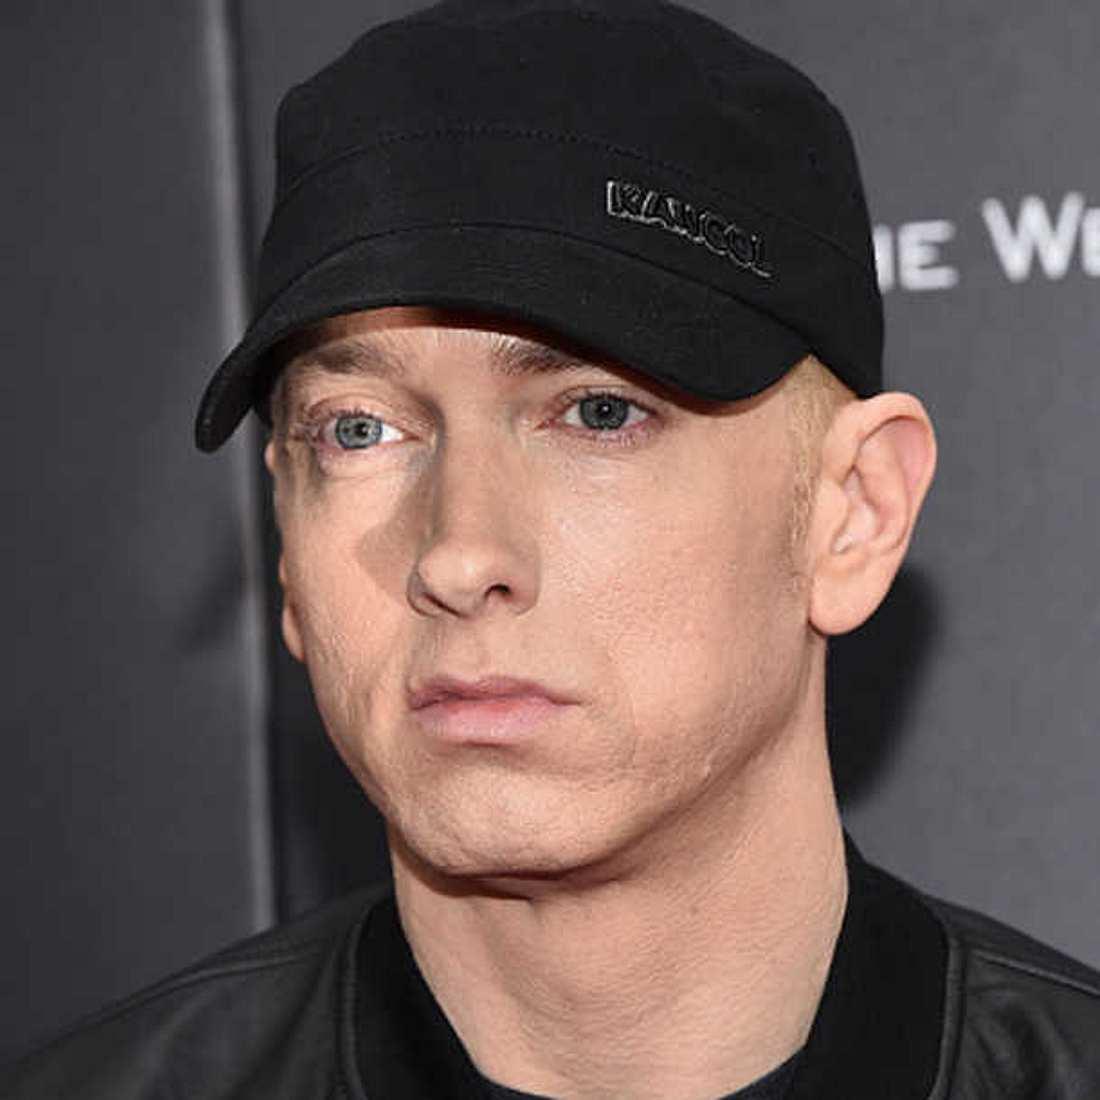 Eminem Schwägerin Drogen Tod